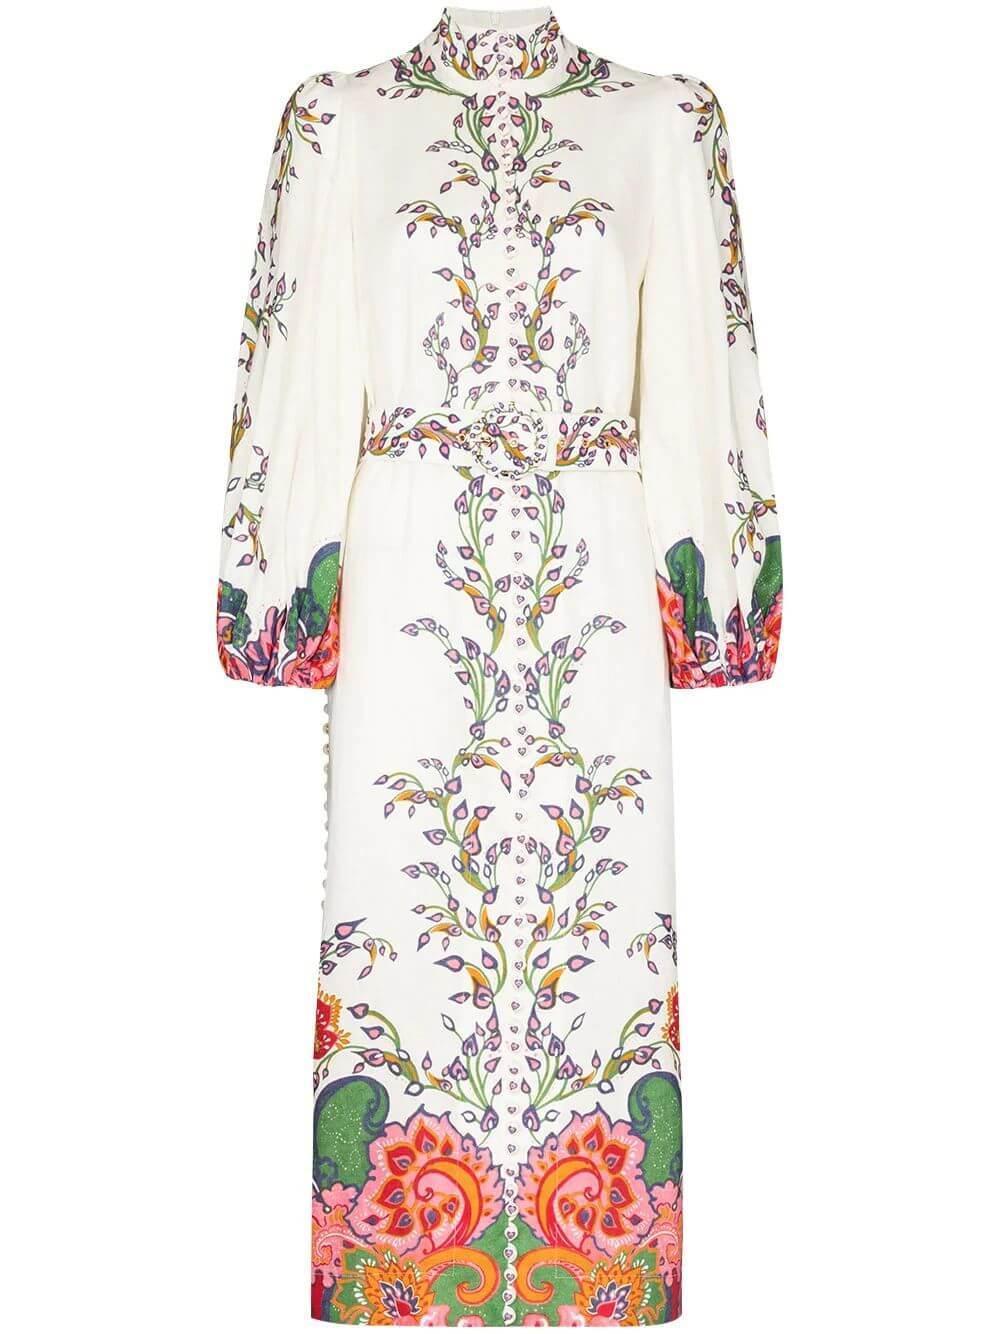 The Lovestruck Midi Dress